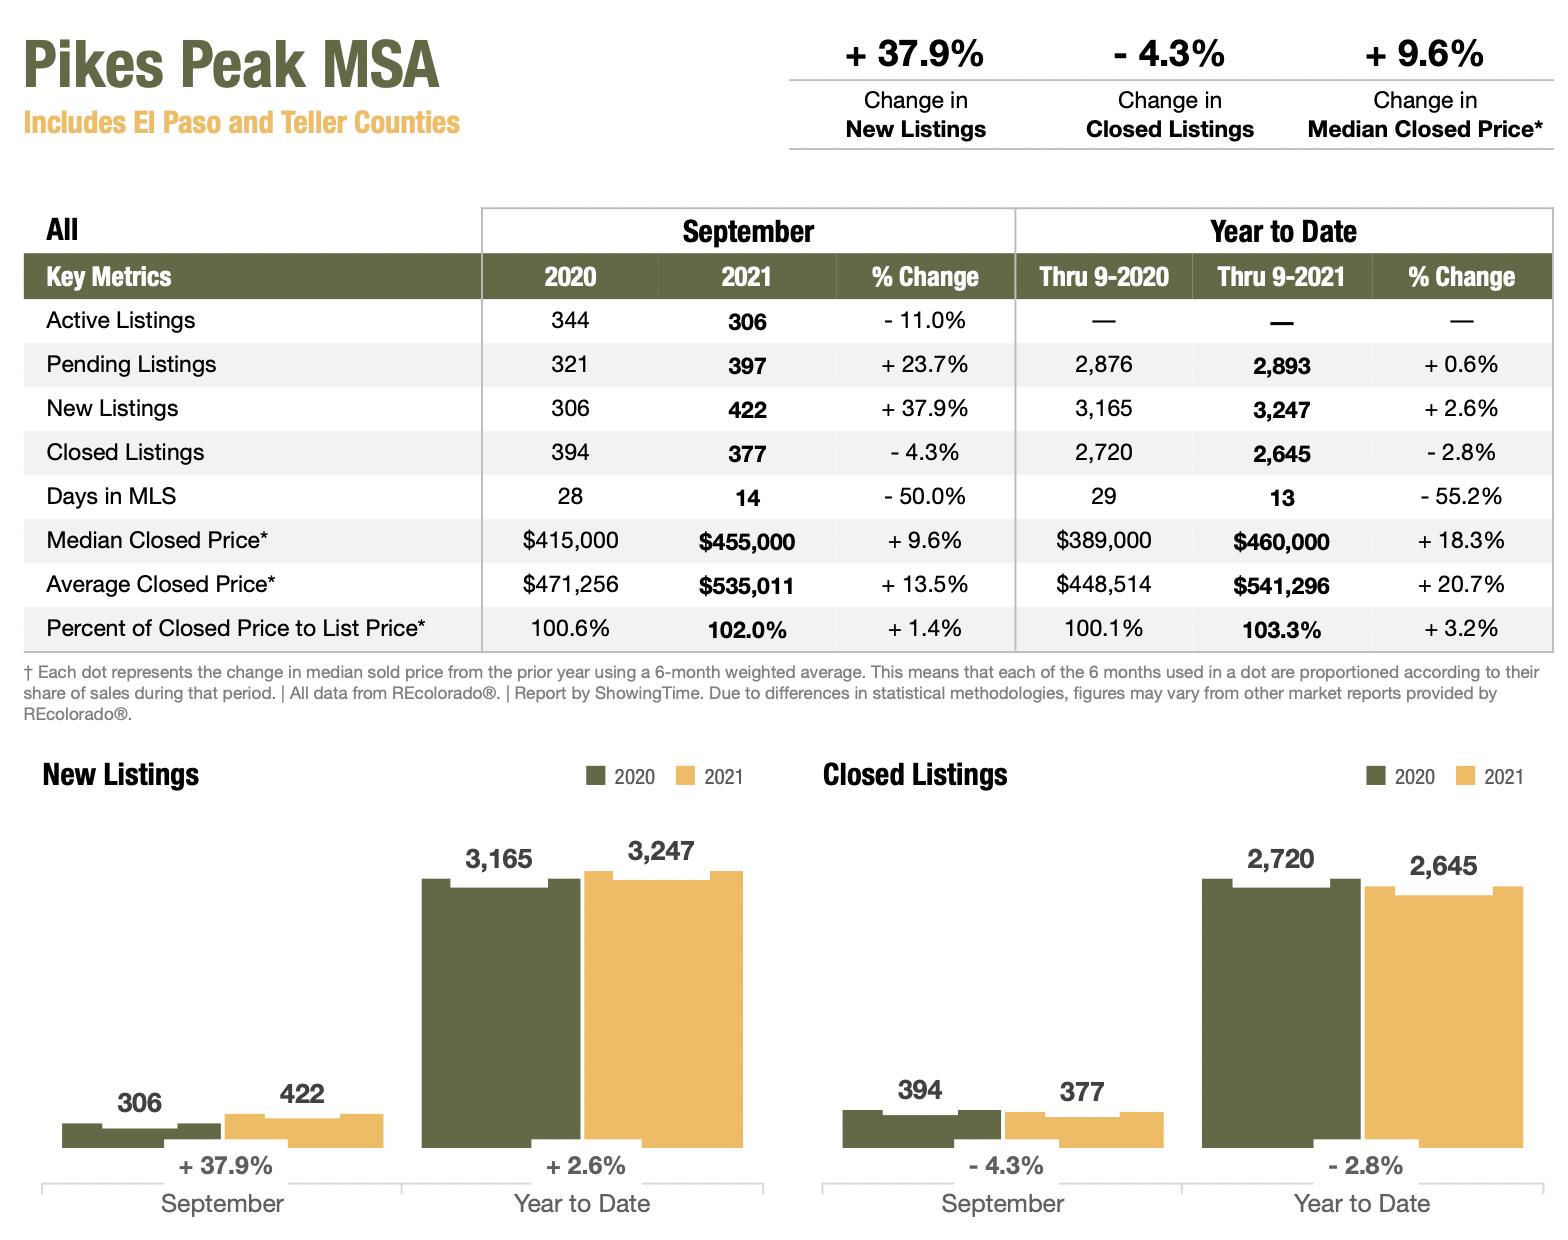 Colorado Real Estate Market Report Pikes Peak MSA September 2021